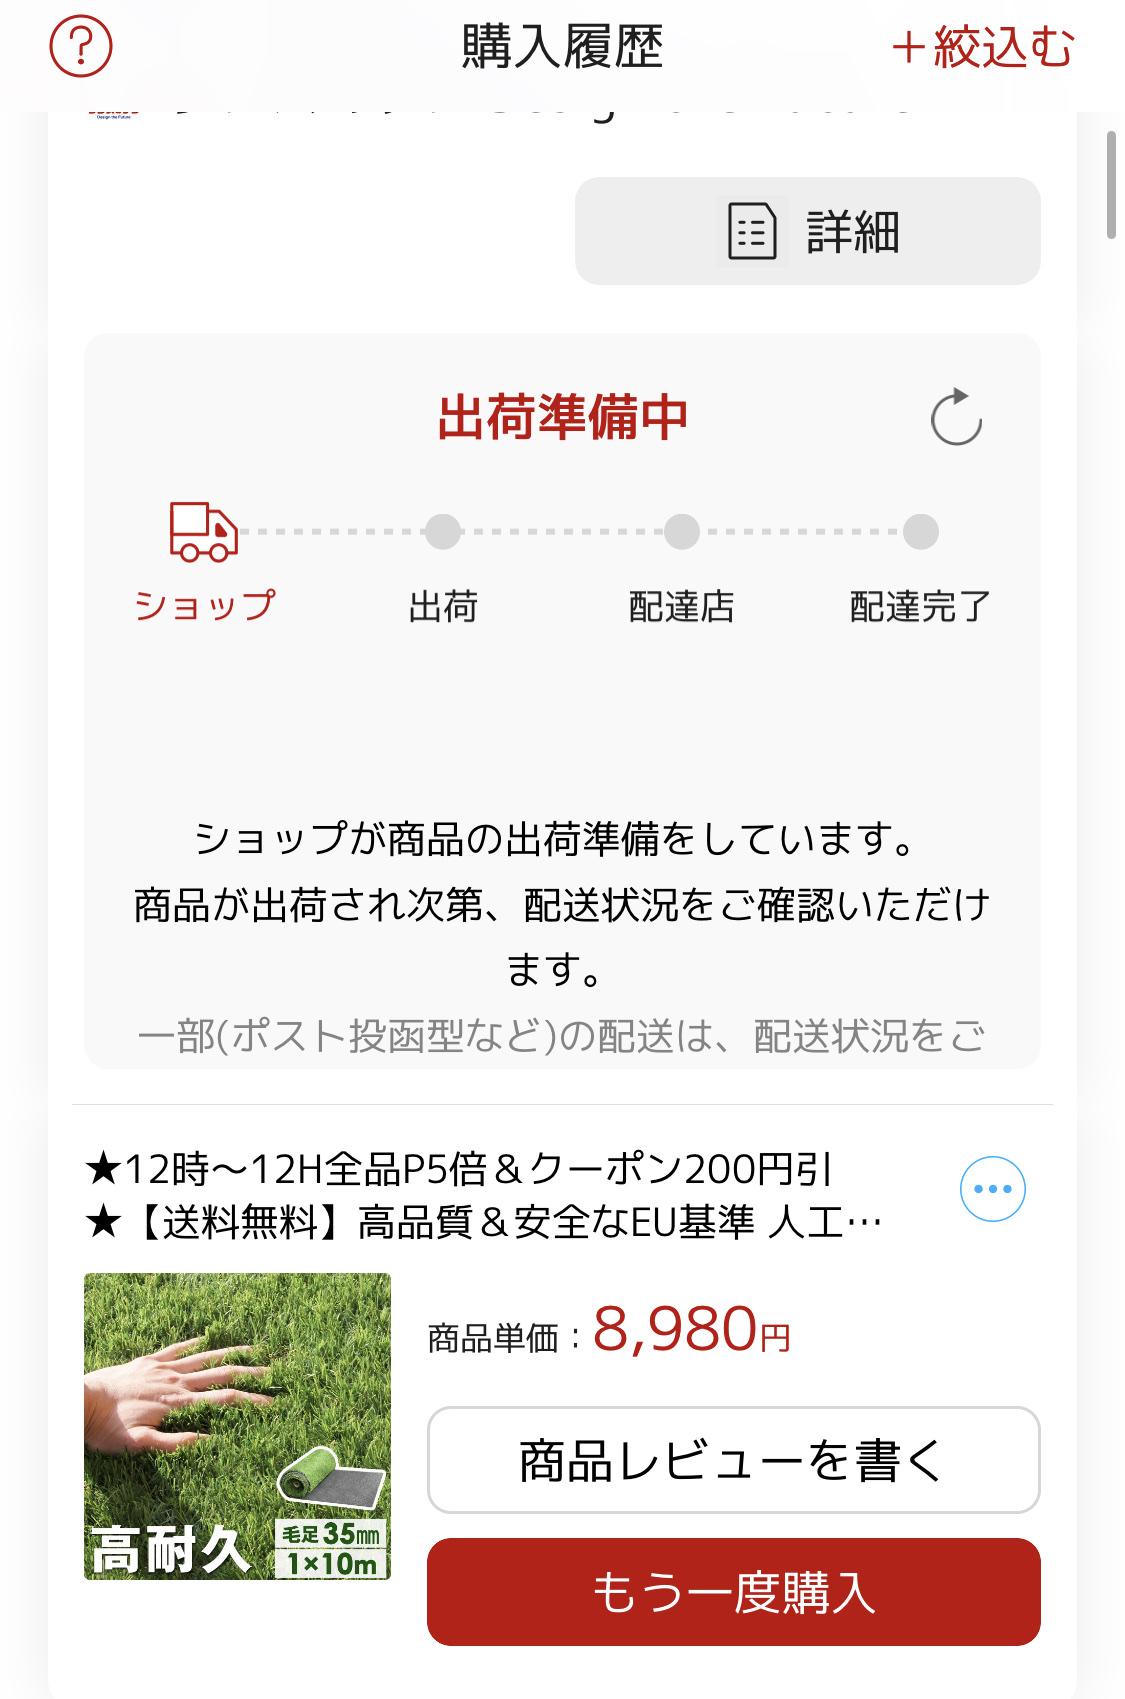 fc2blog_20200325080736877.jpg